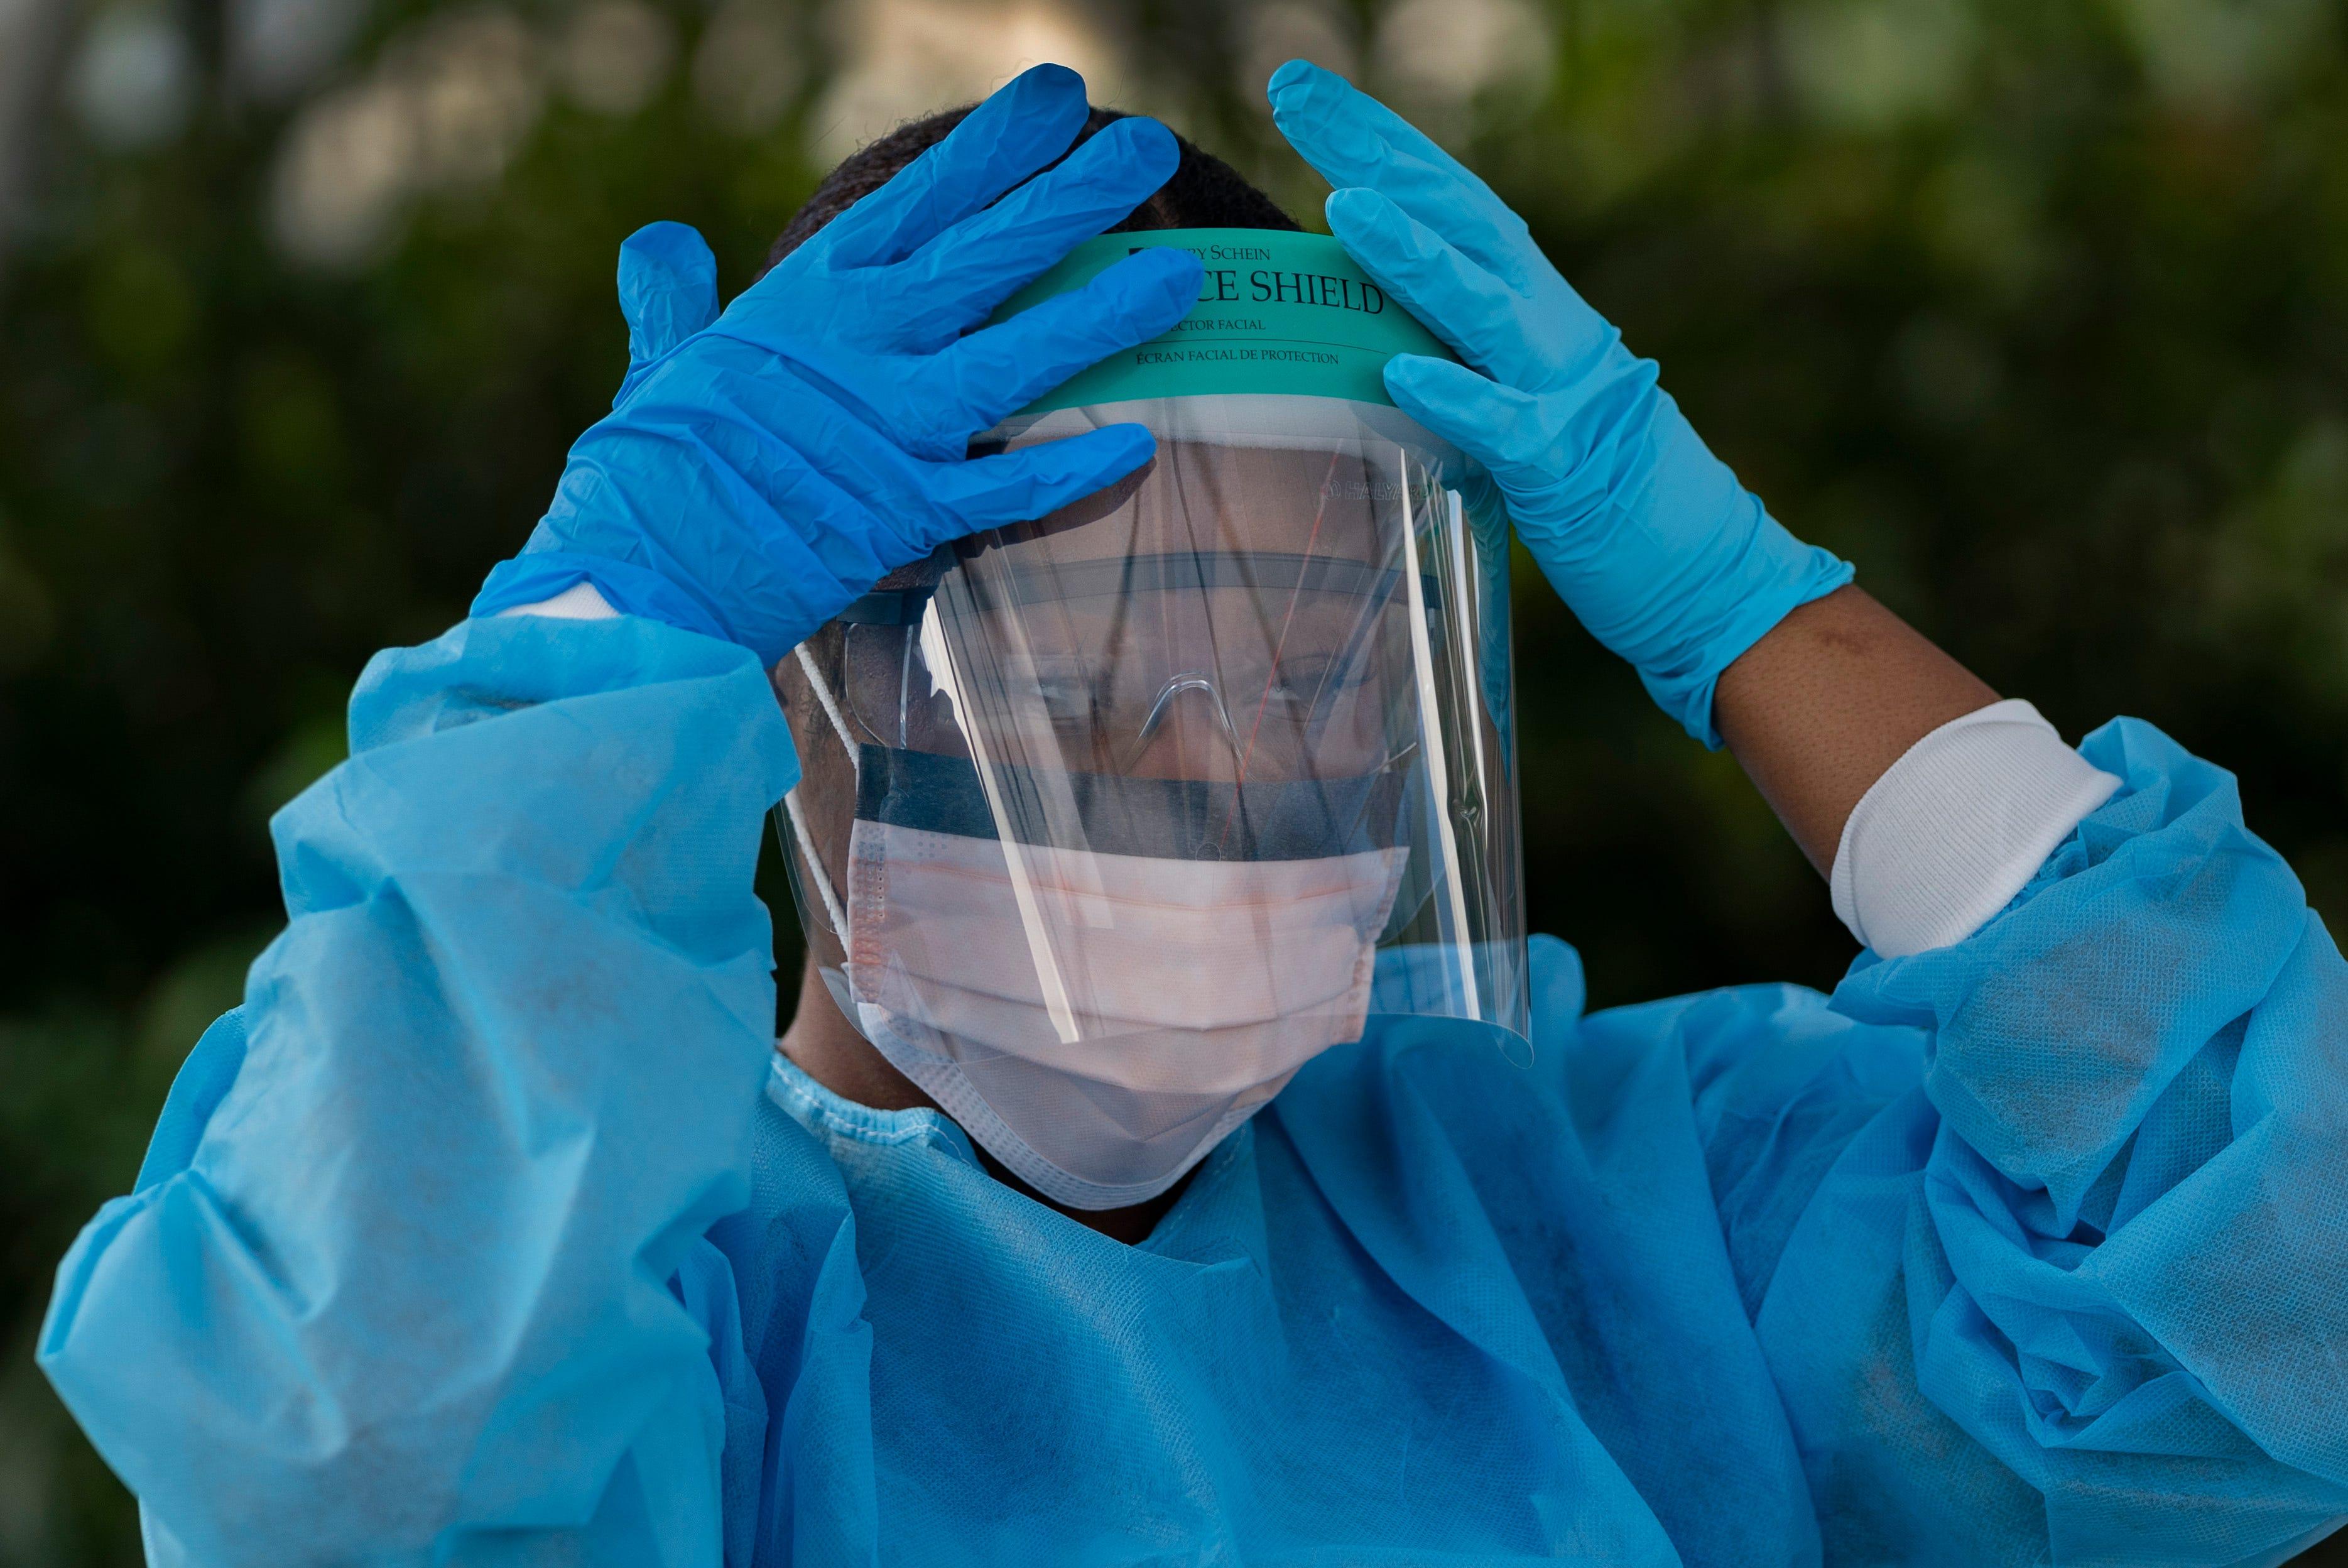 Coronavirus kills 1,000 in a single day in...